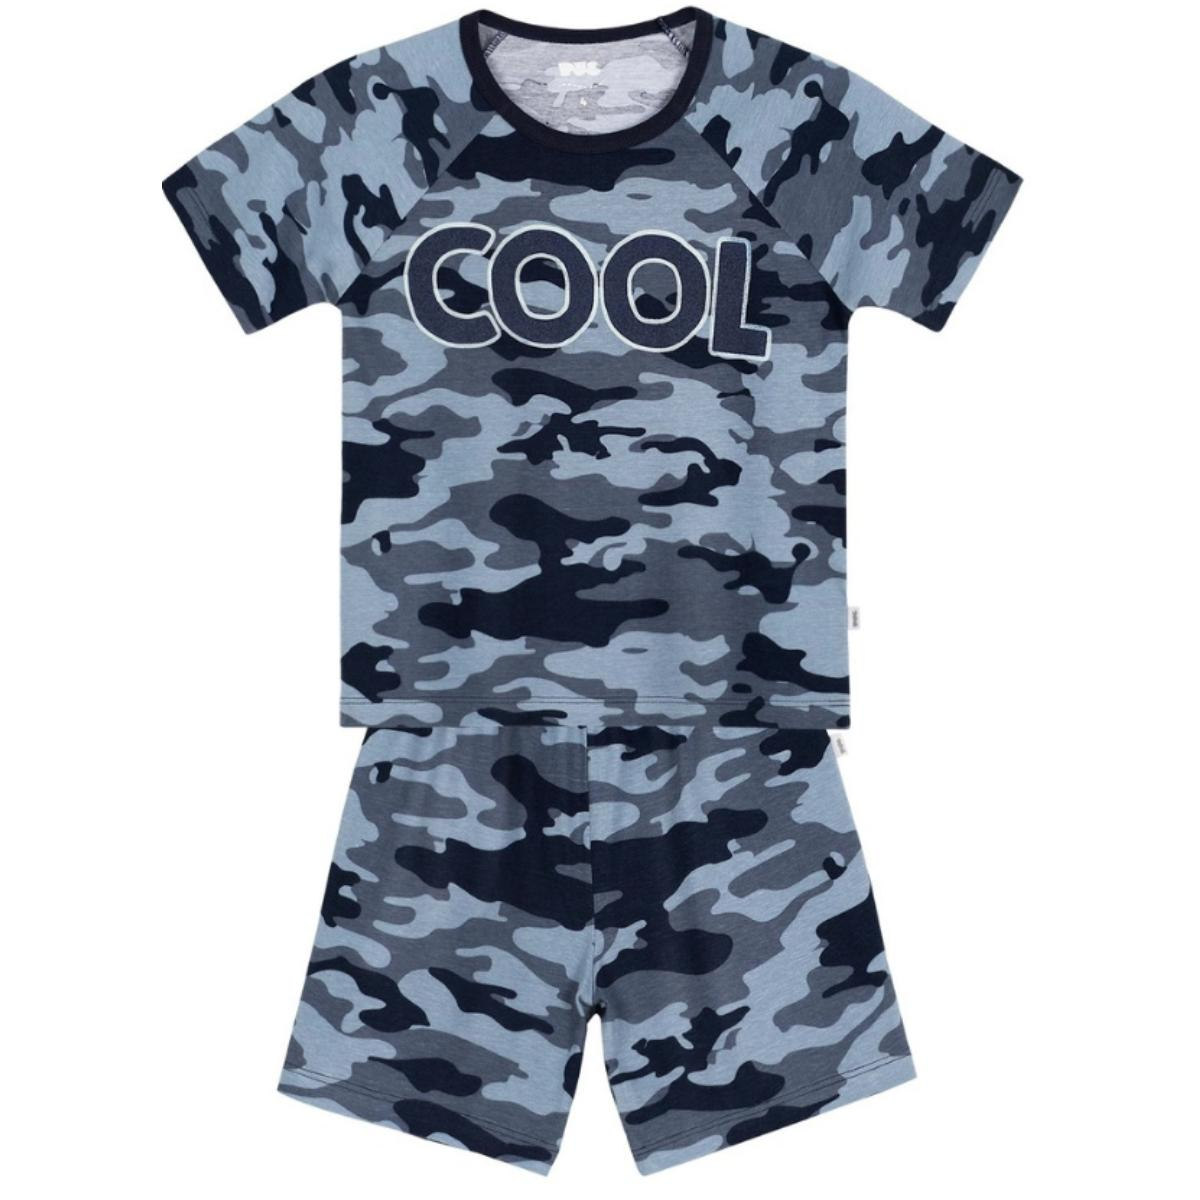 Pijama Masc Infantil Puc 26r9 1cen Azul Camuflado